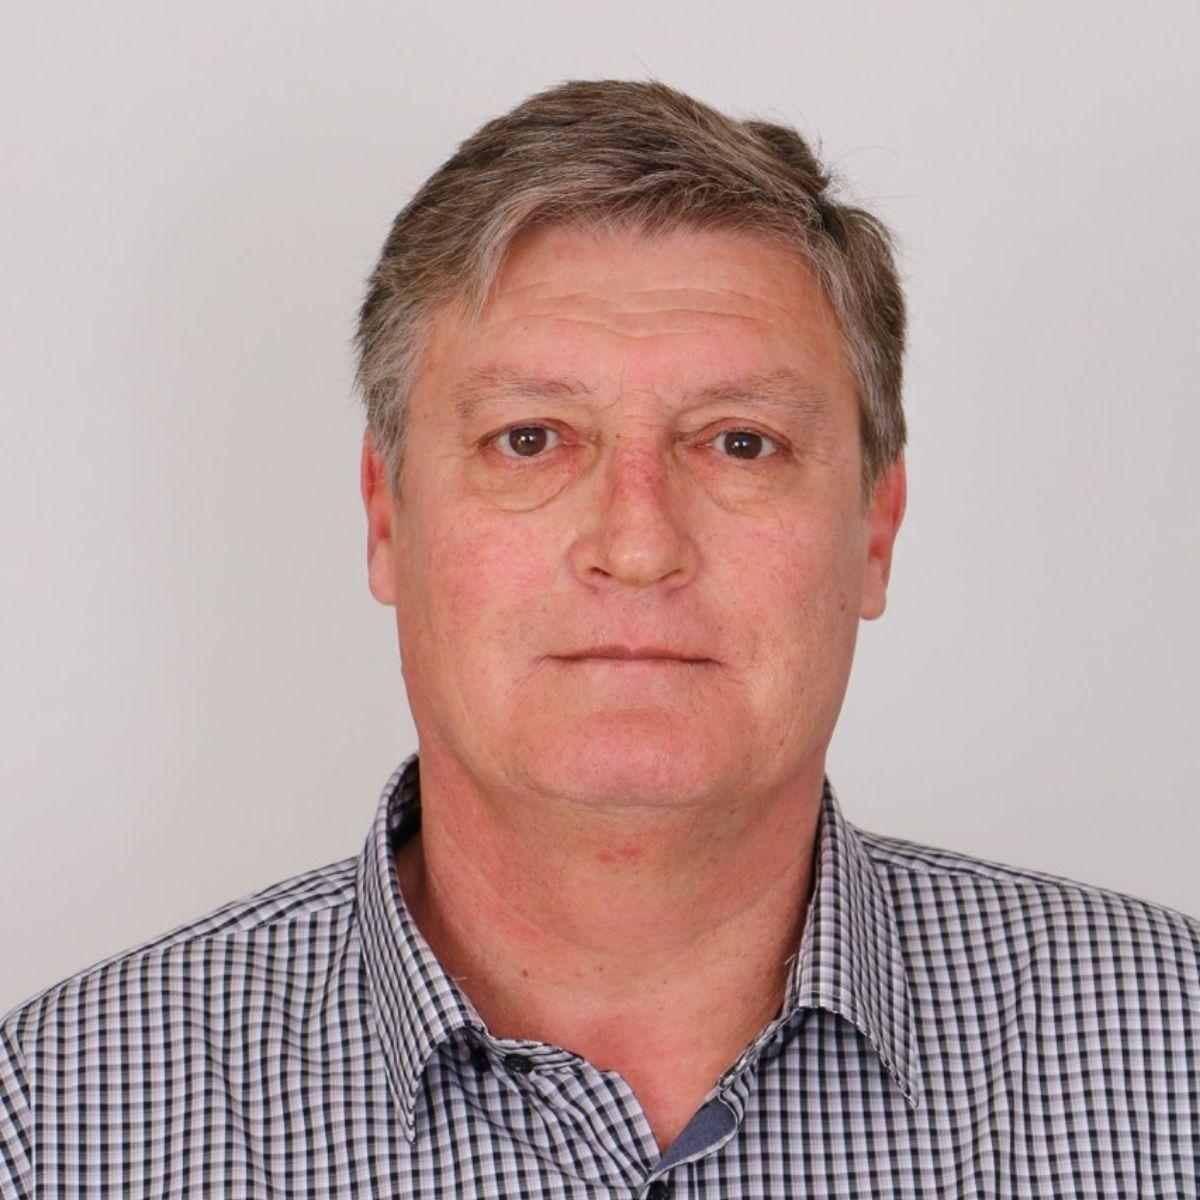 Алексей Анцирев